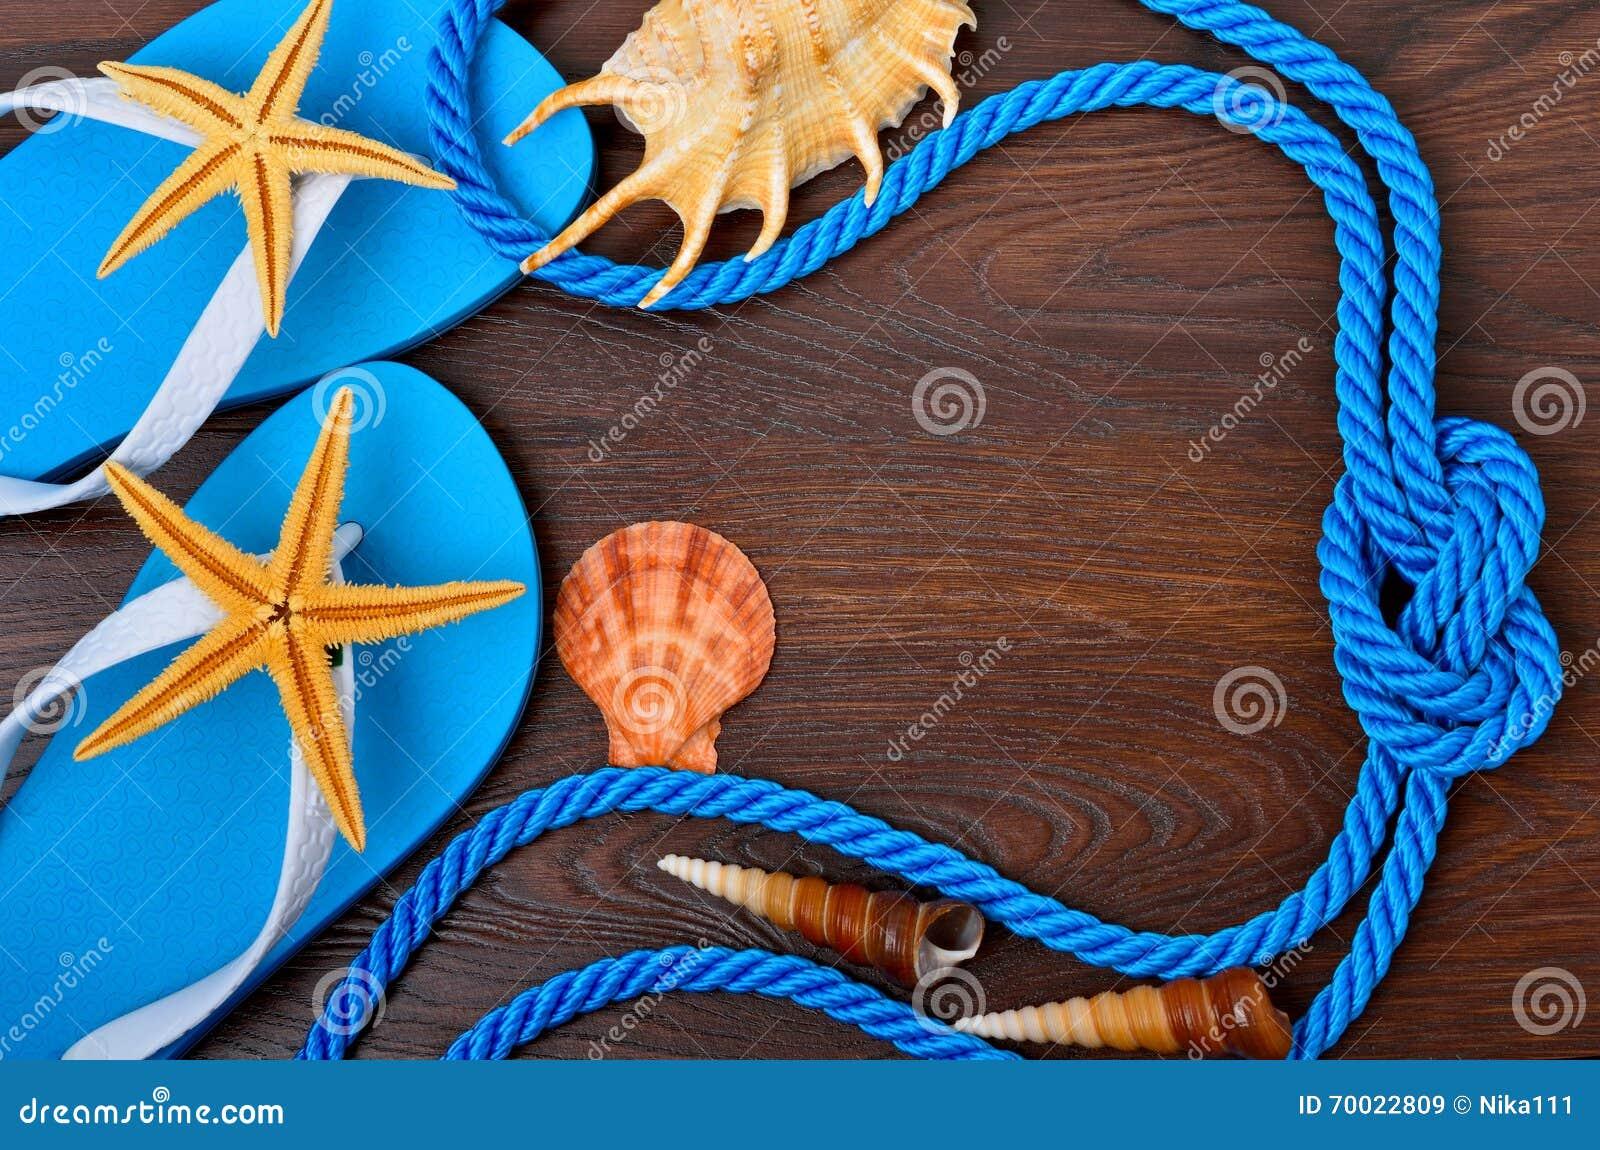 Flip-flops, starfish and seashells.